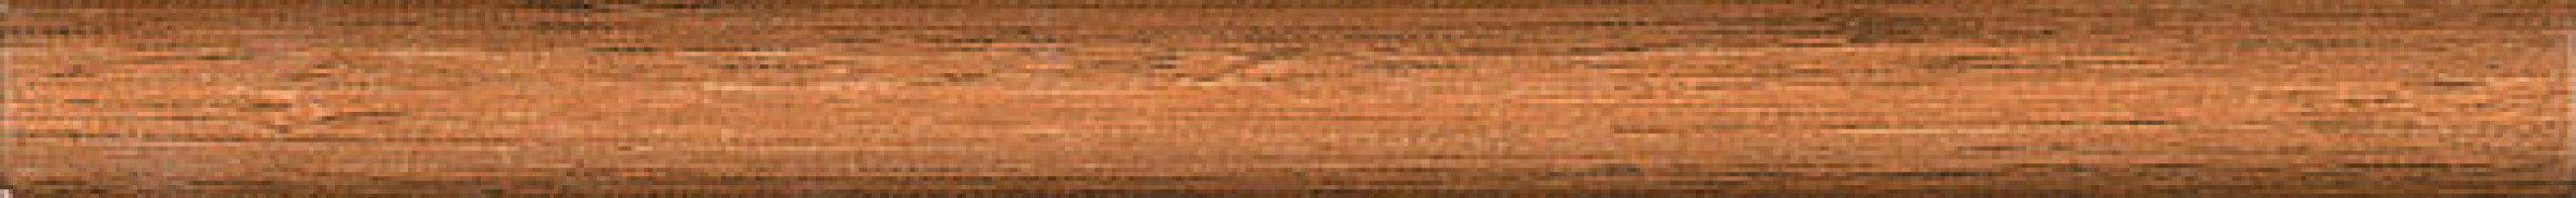 Бордюр 119 Карандаш Дерево коричневый матовый 25х2 Kerama Marazzi